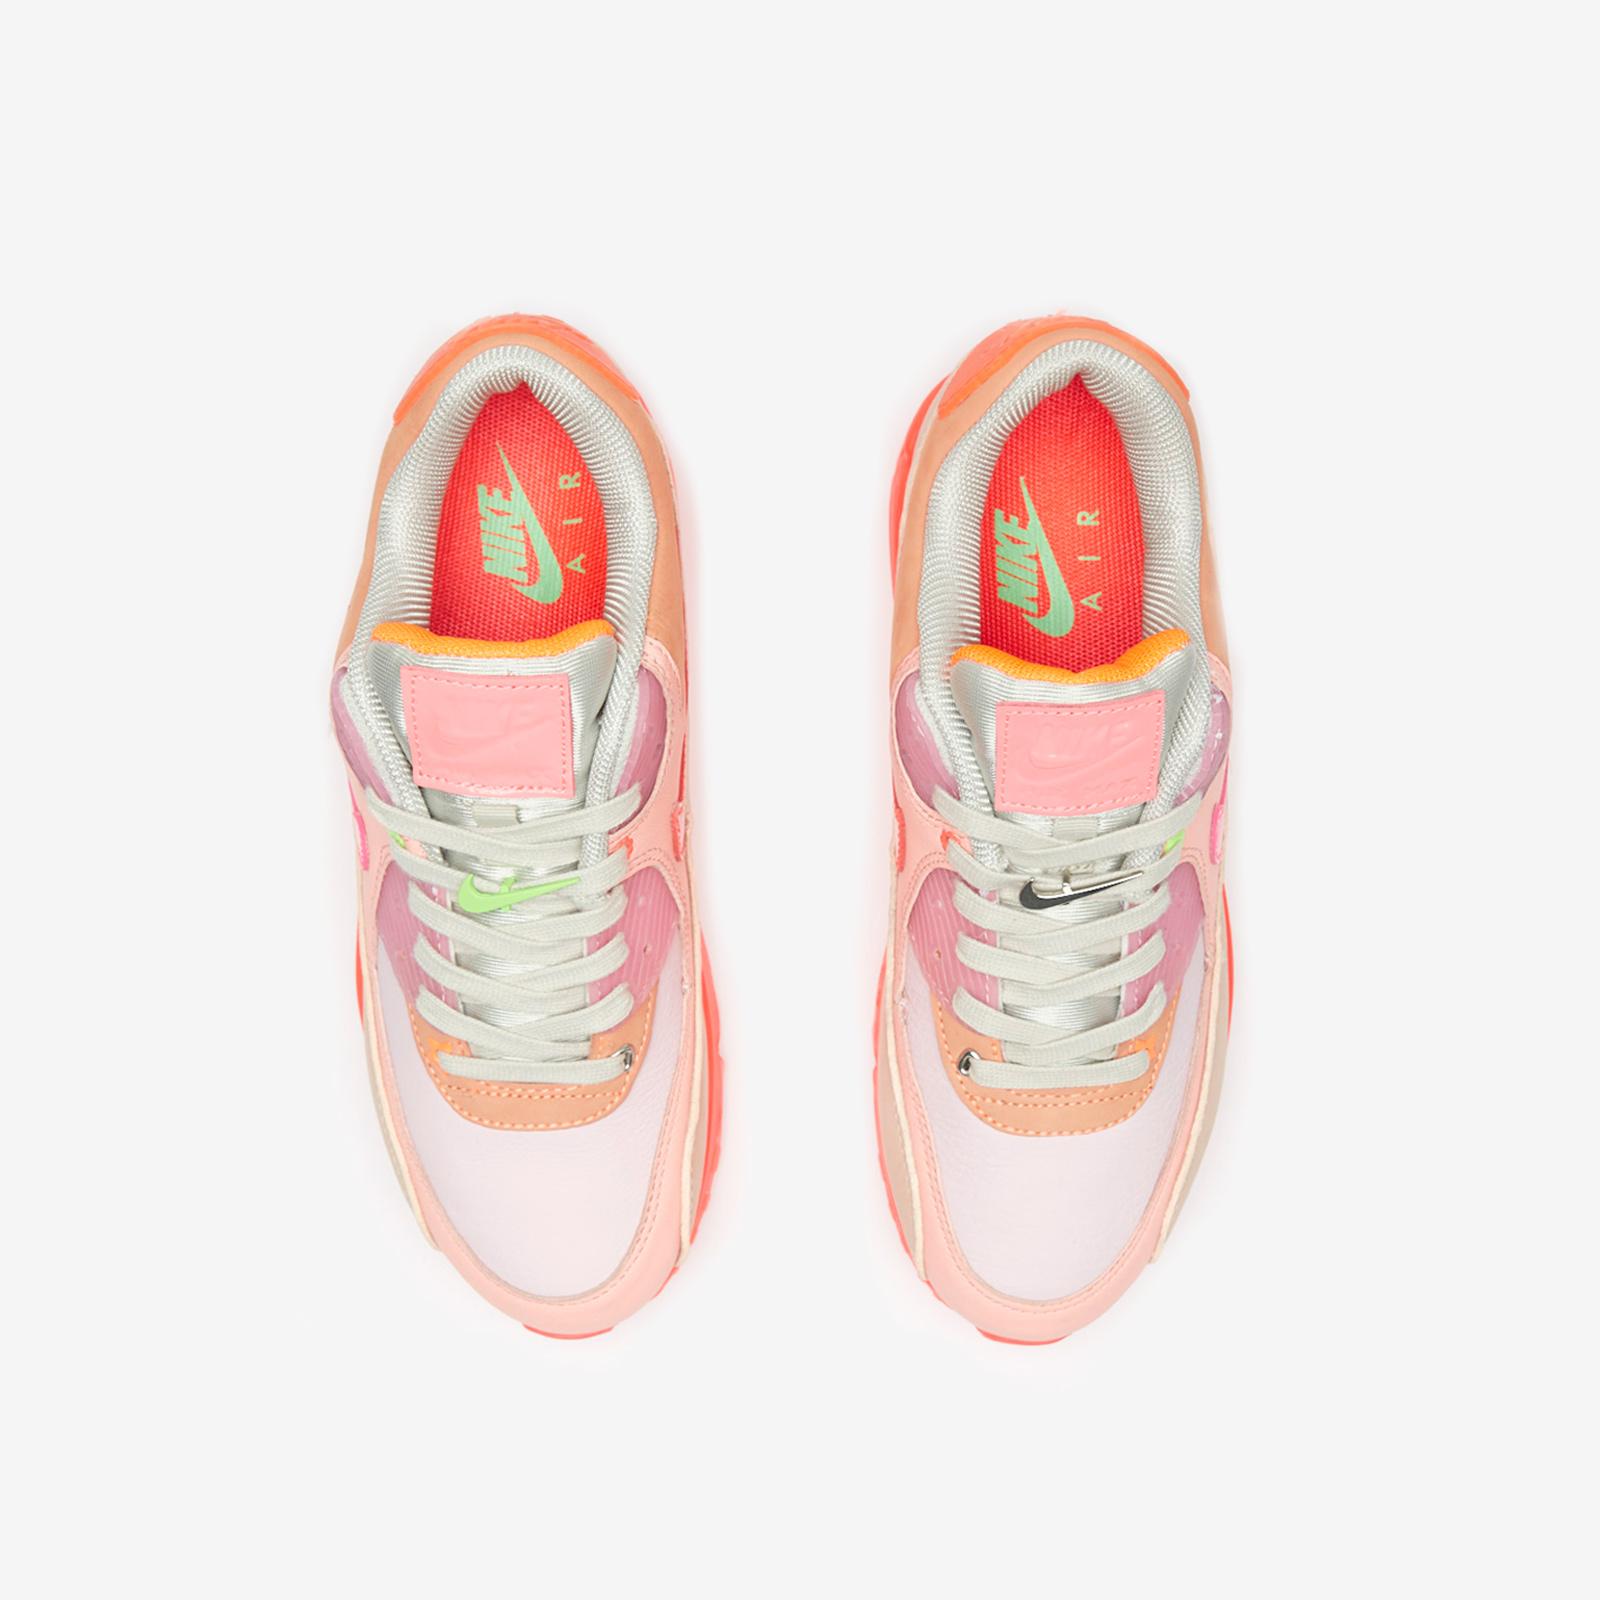 Nike Wmns Air Max 90 NBHD Ct3449 600 Sneakersnstuff